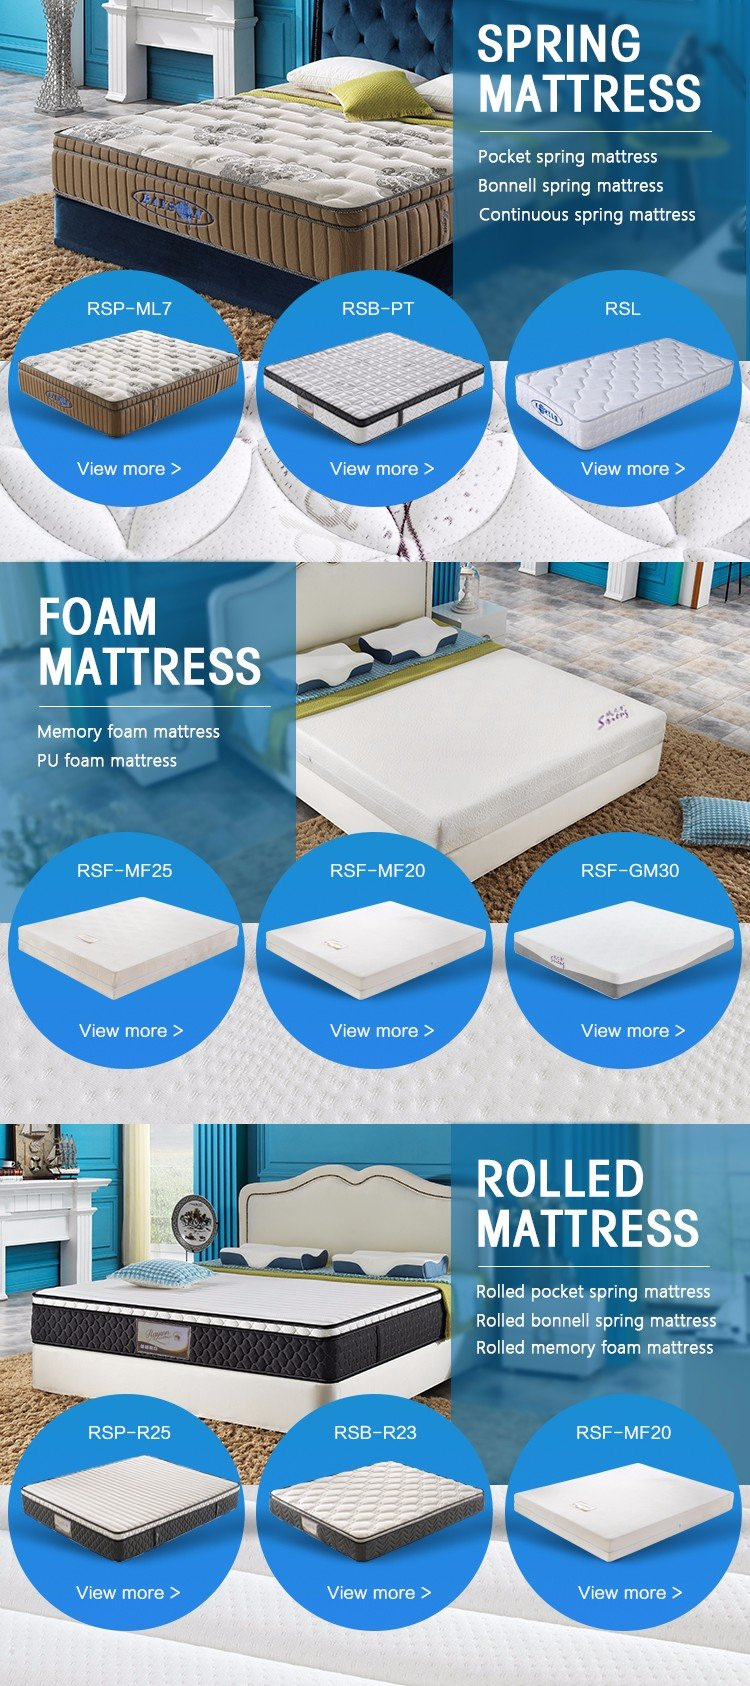 Best pocket spring mattress royal Suppliers-8